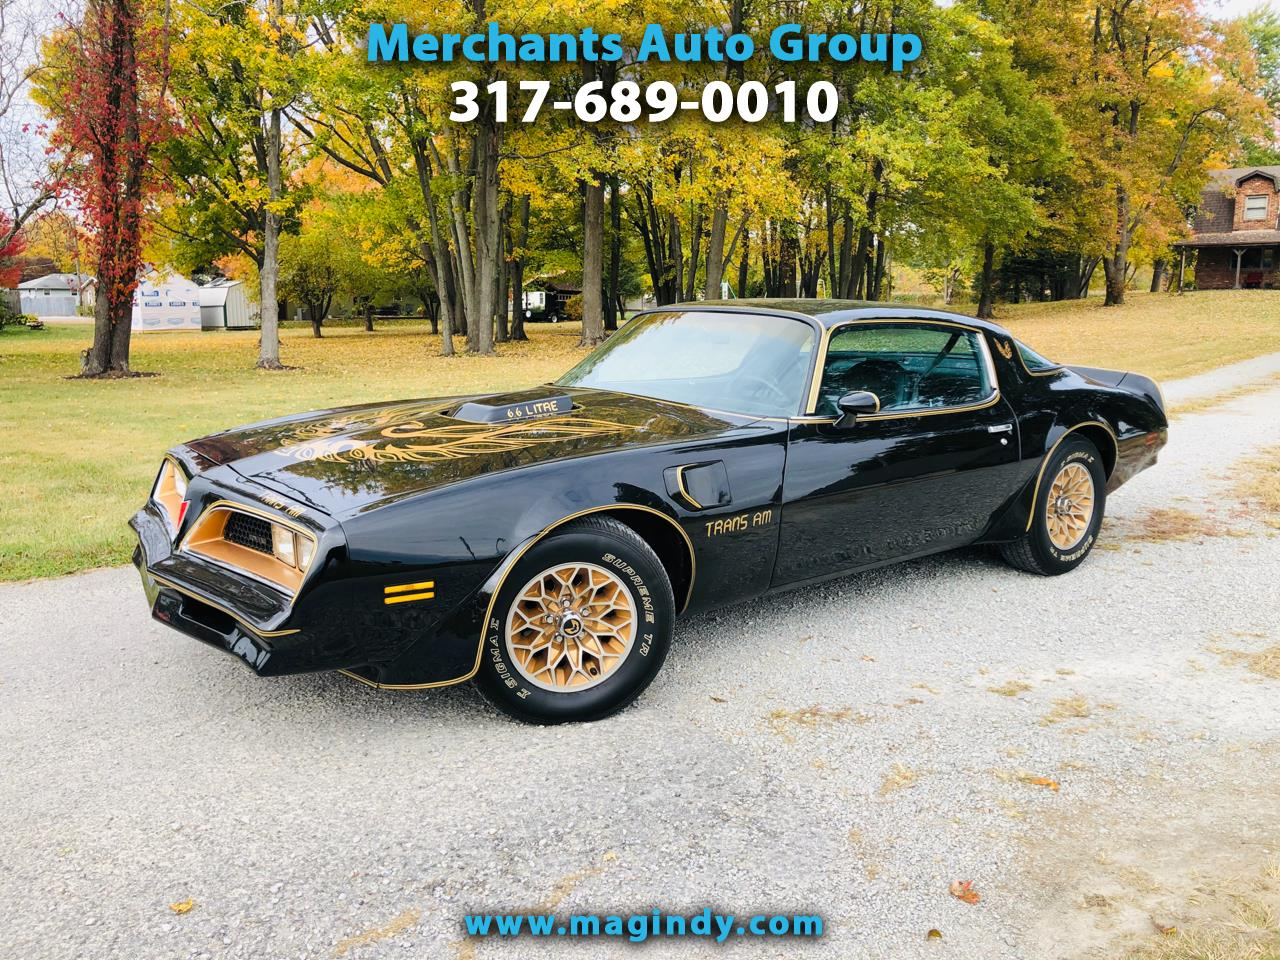 1977 Pontiac Trans Am Golden Eagle